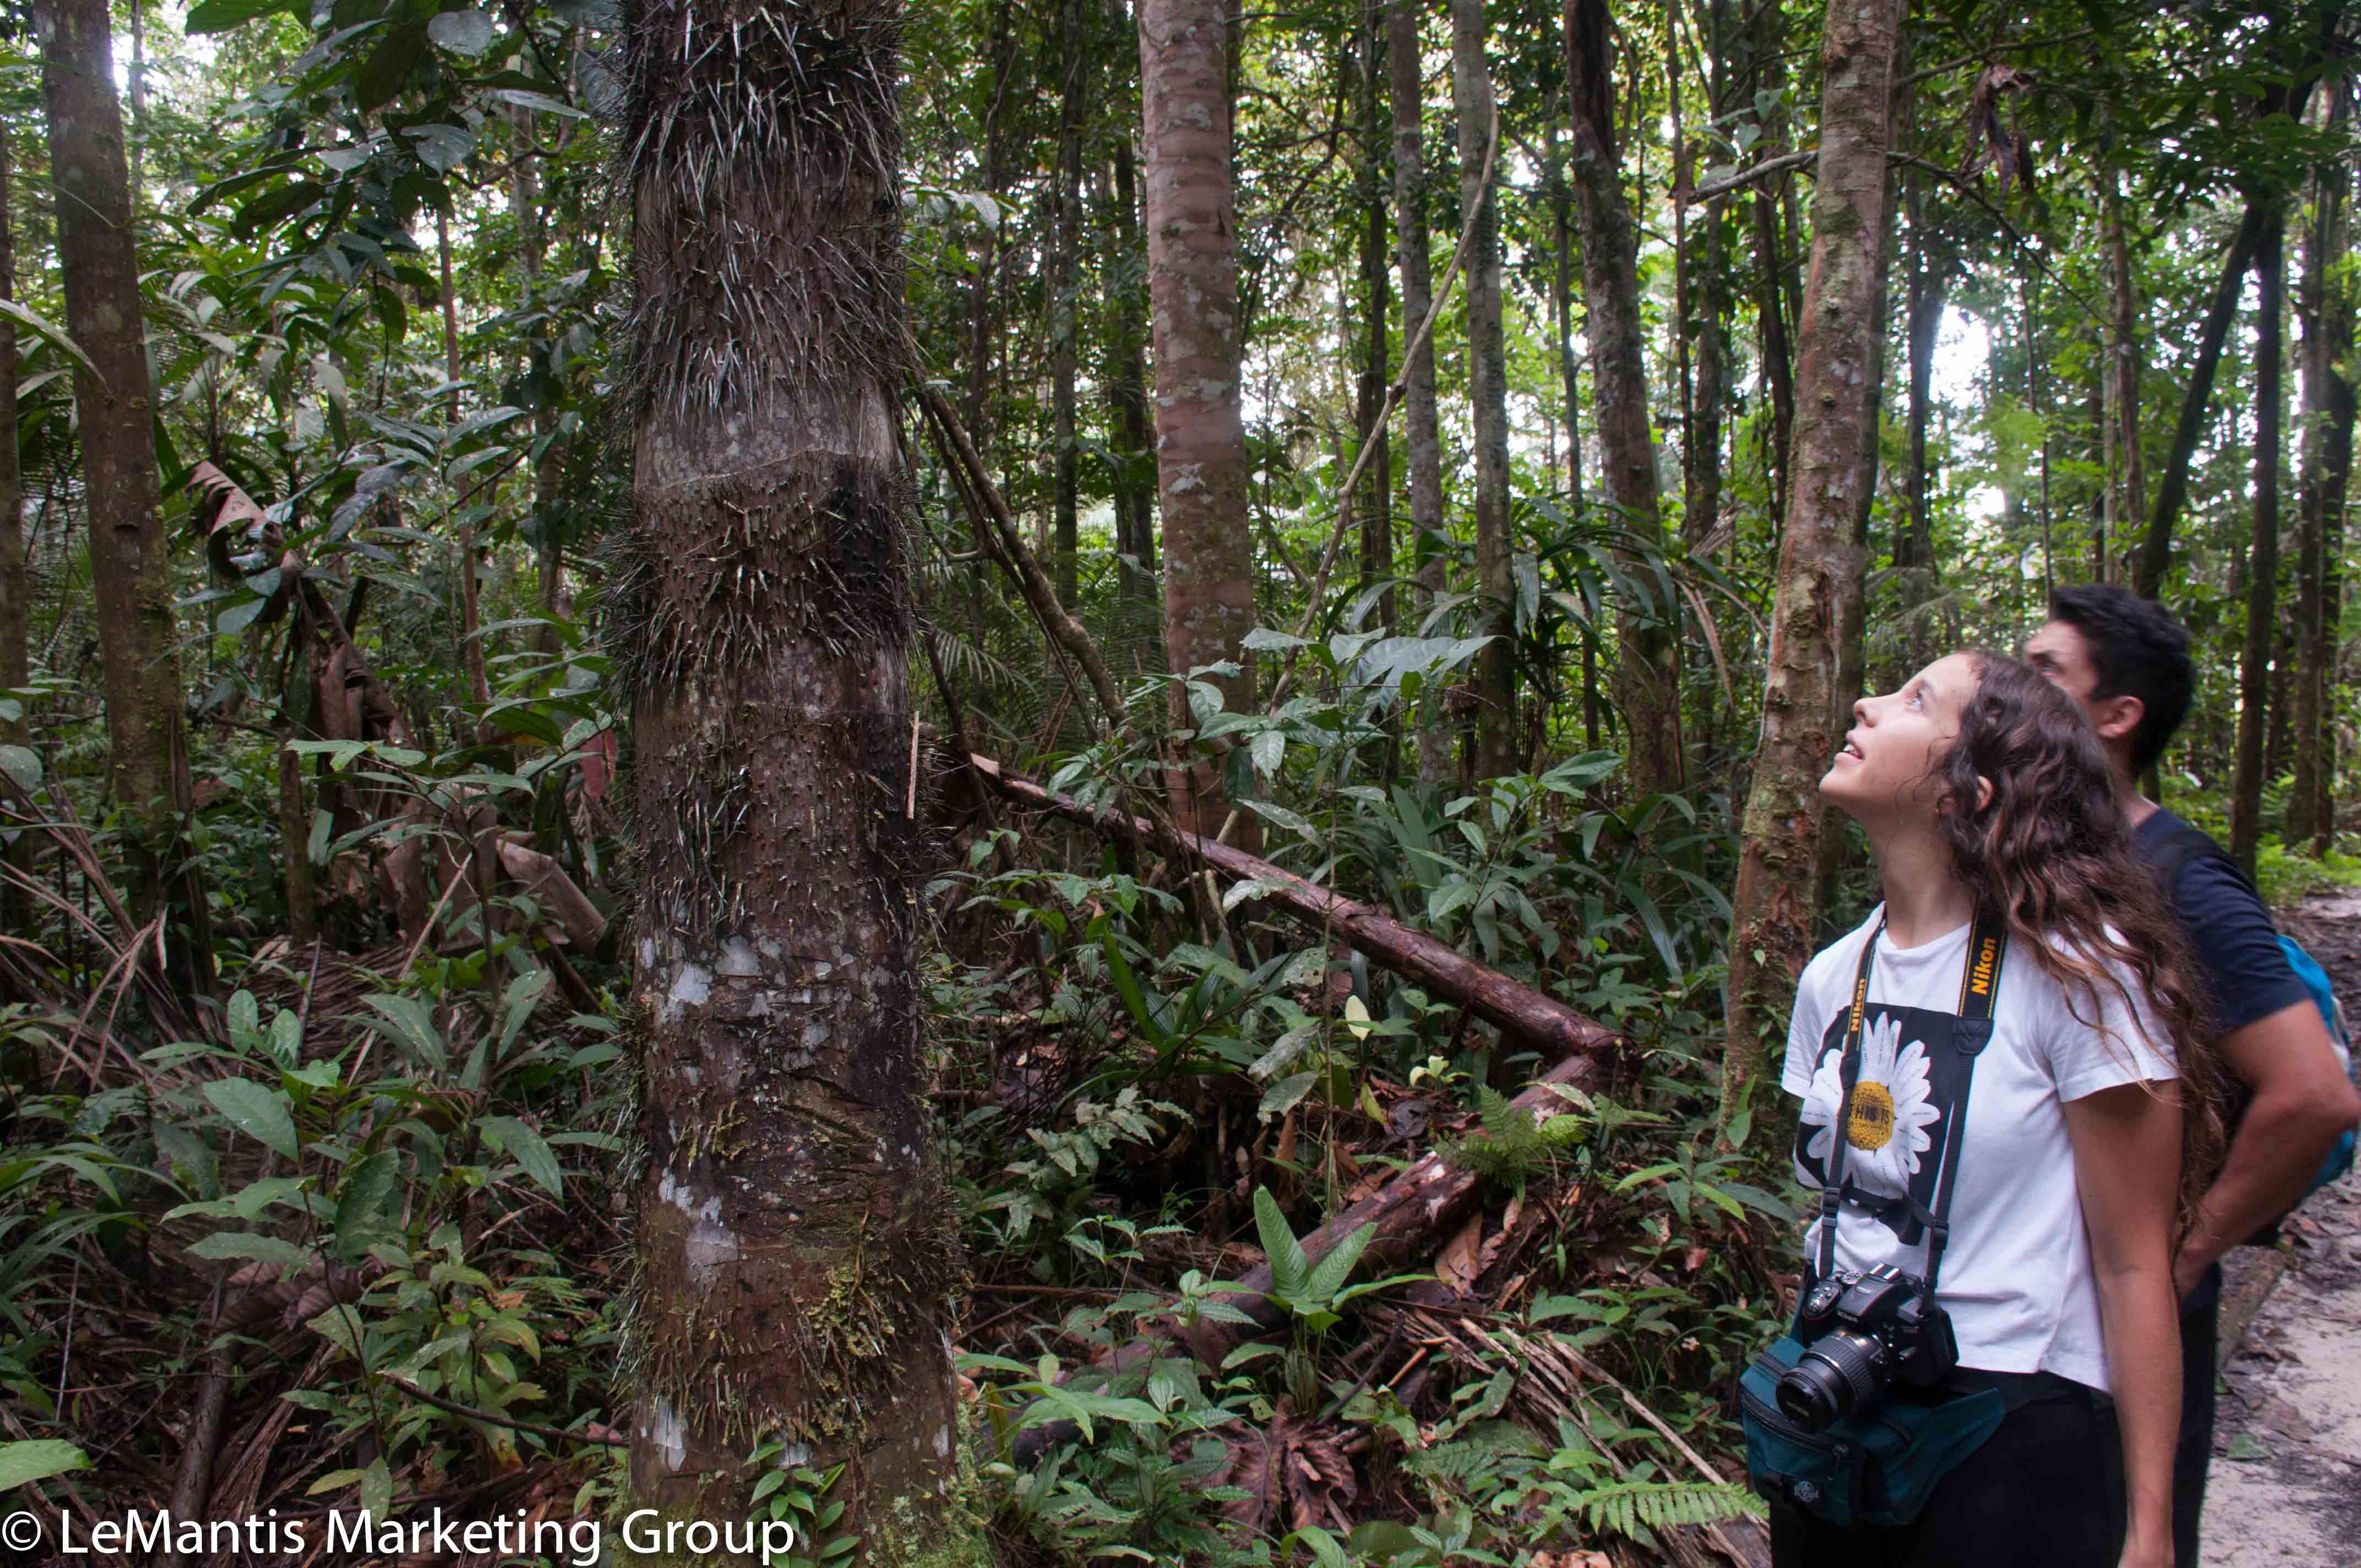 avistamiento de aves amazonas (2)